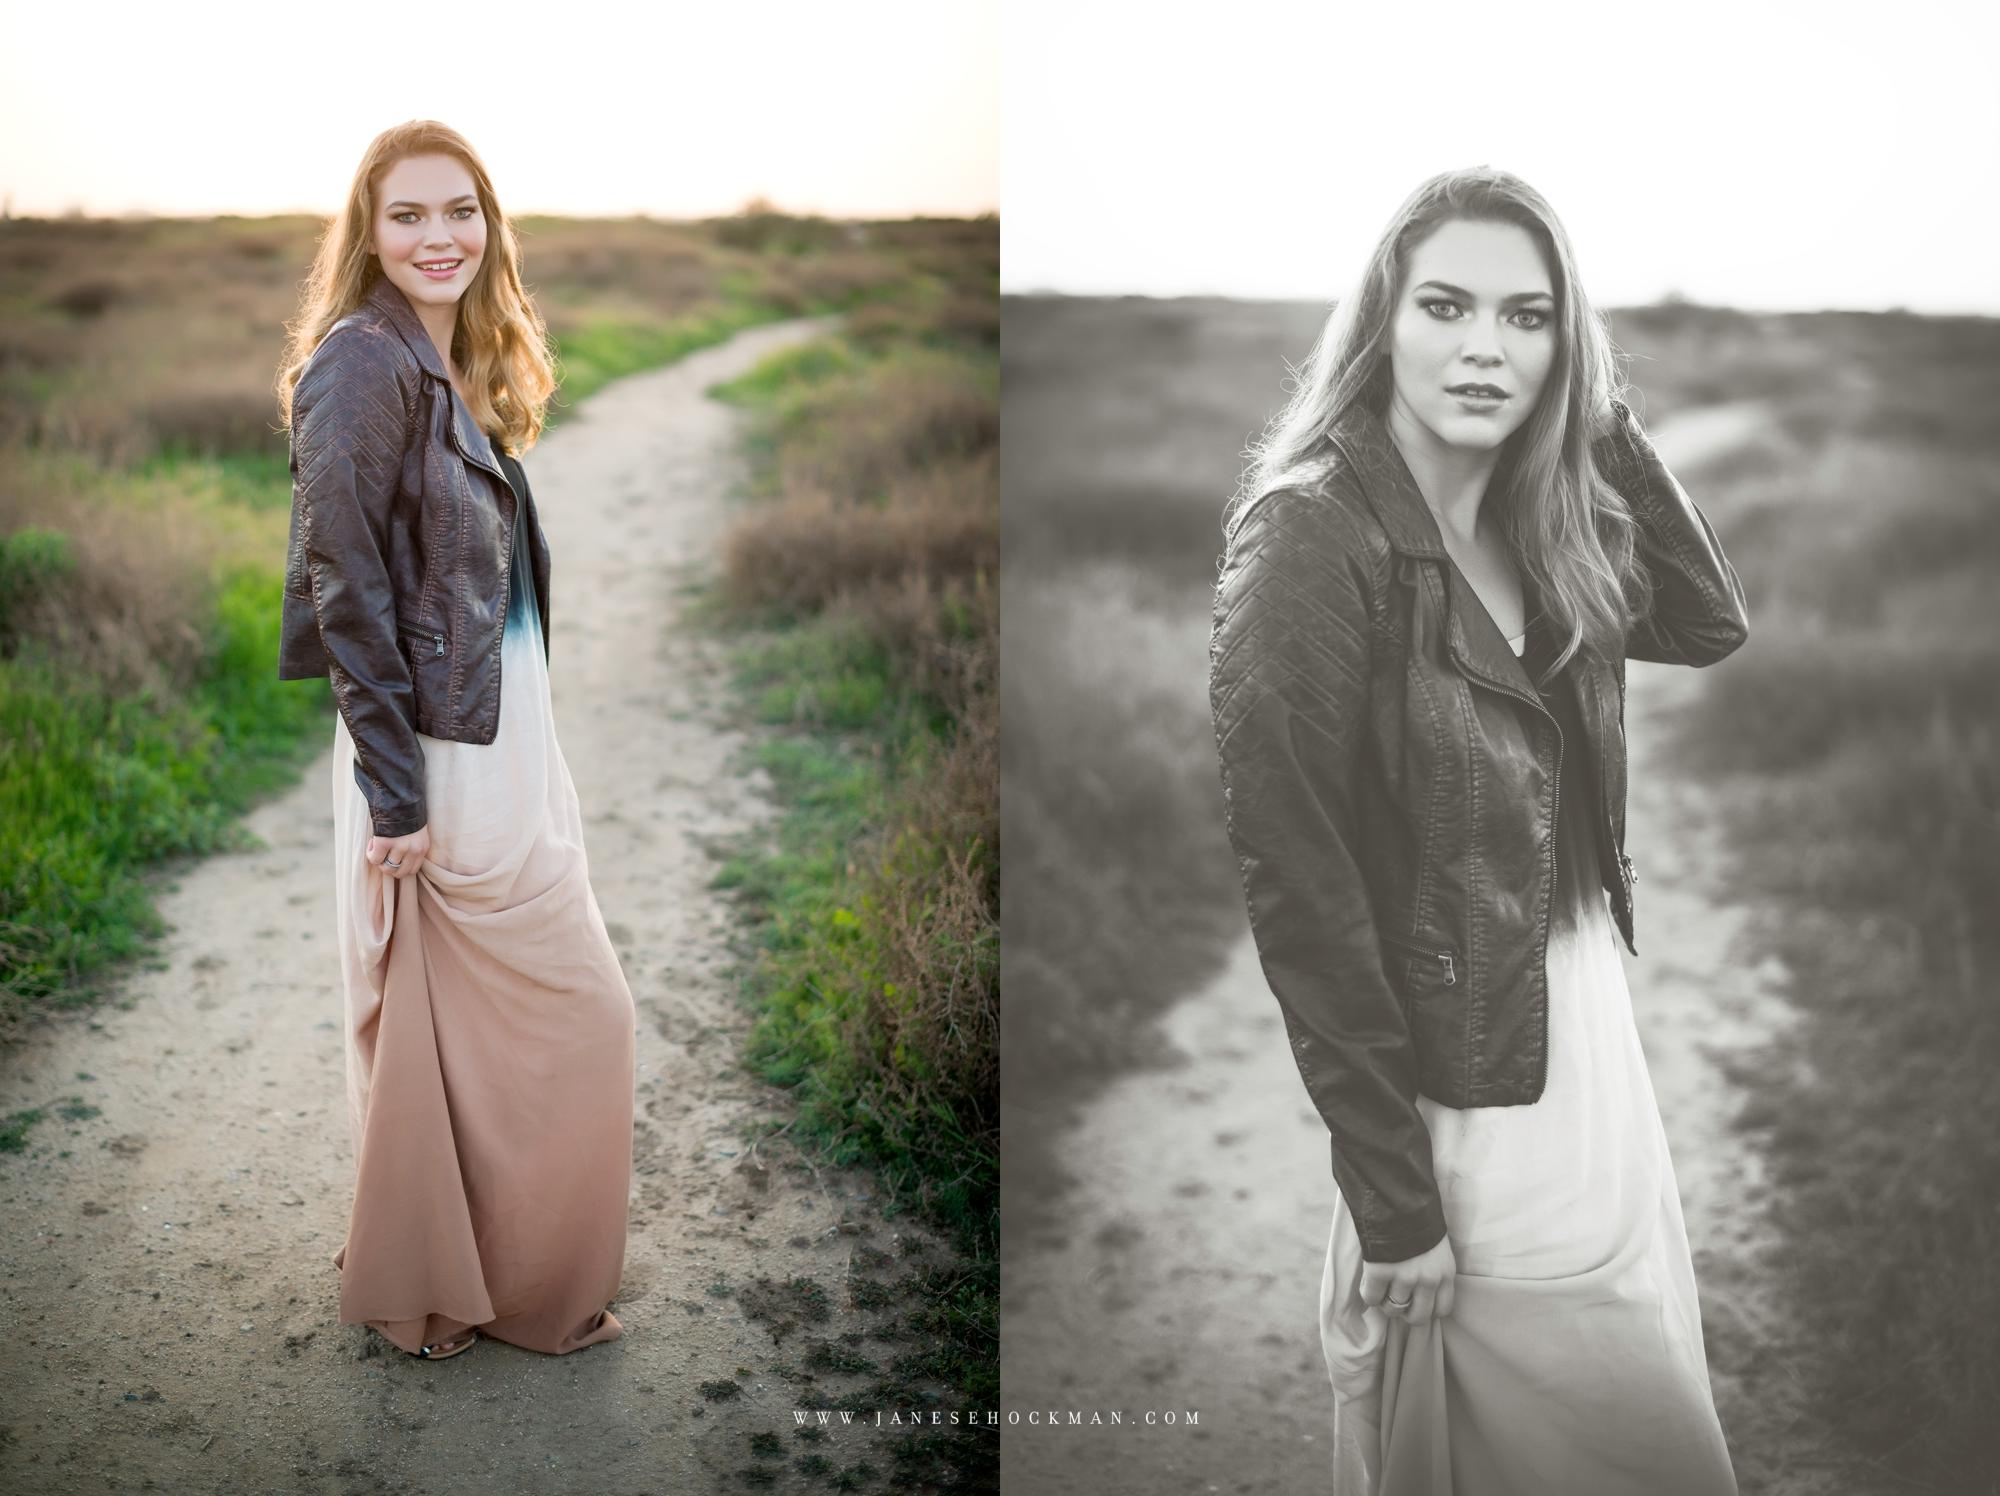 Holly   Janese Hockman Photography   San Luis Obispo, California   High School Senior Portraits   Huntington Beach 3.jpg